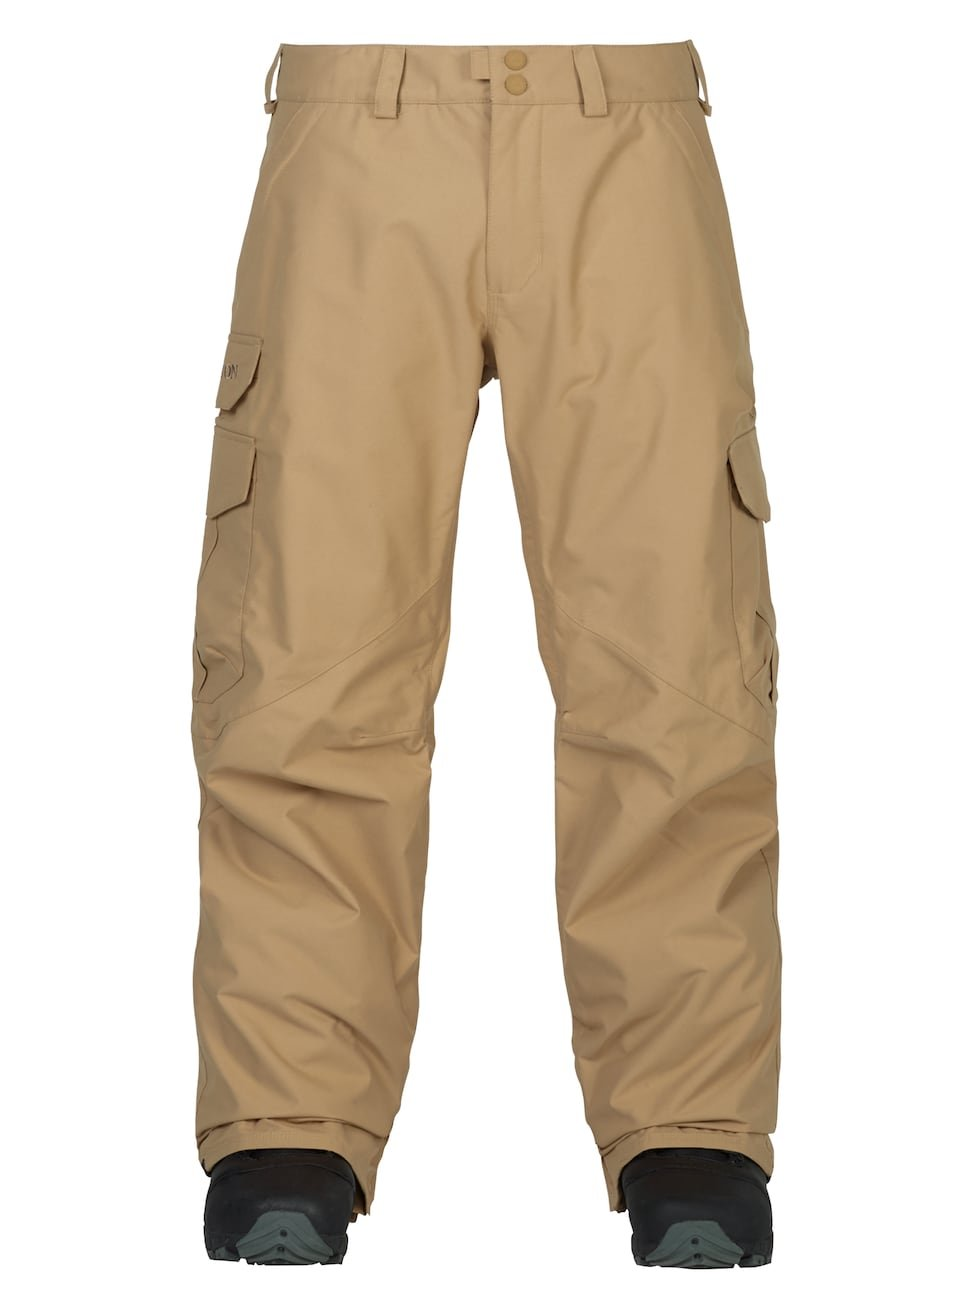 Burton Men's Cargo Pant Mid Fit, Kelp '17, X-Small by Burton